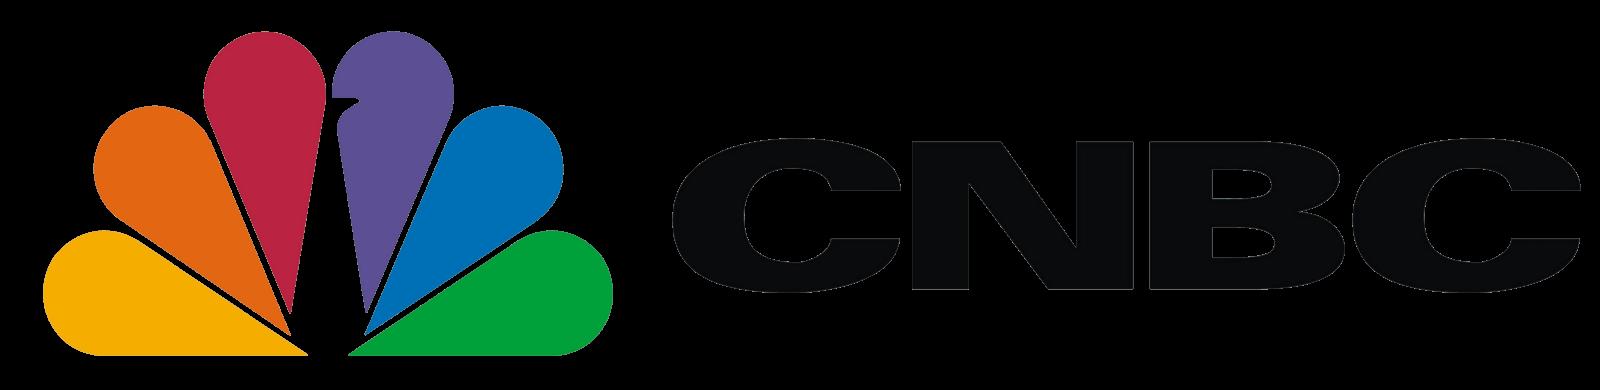 CNBC-logo-1-1600x390